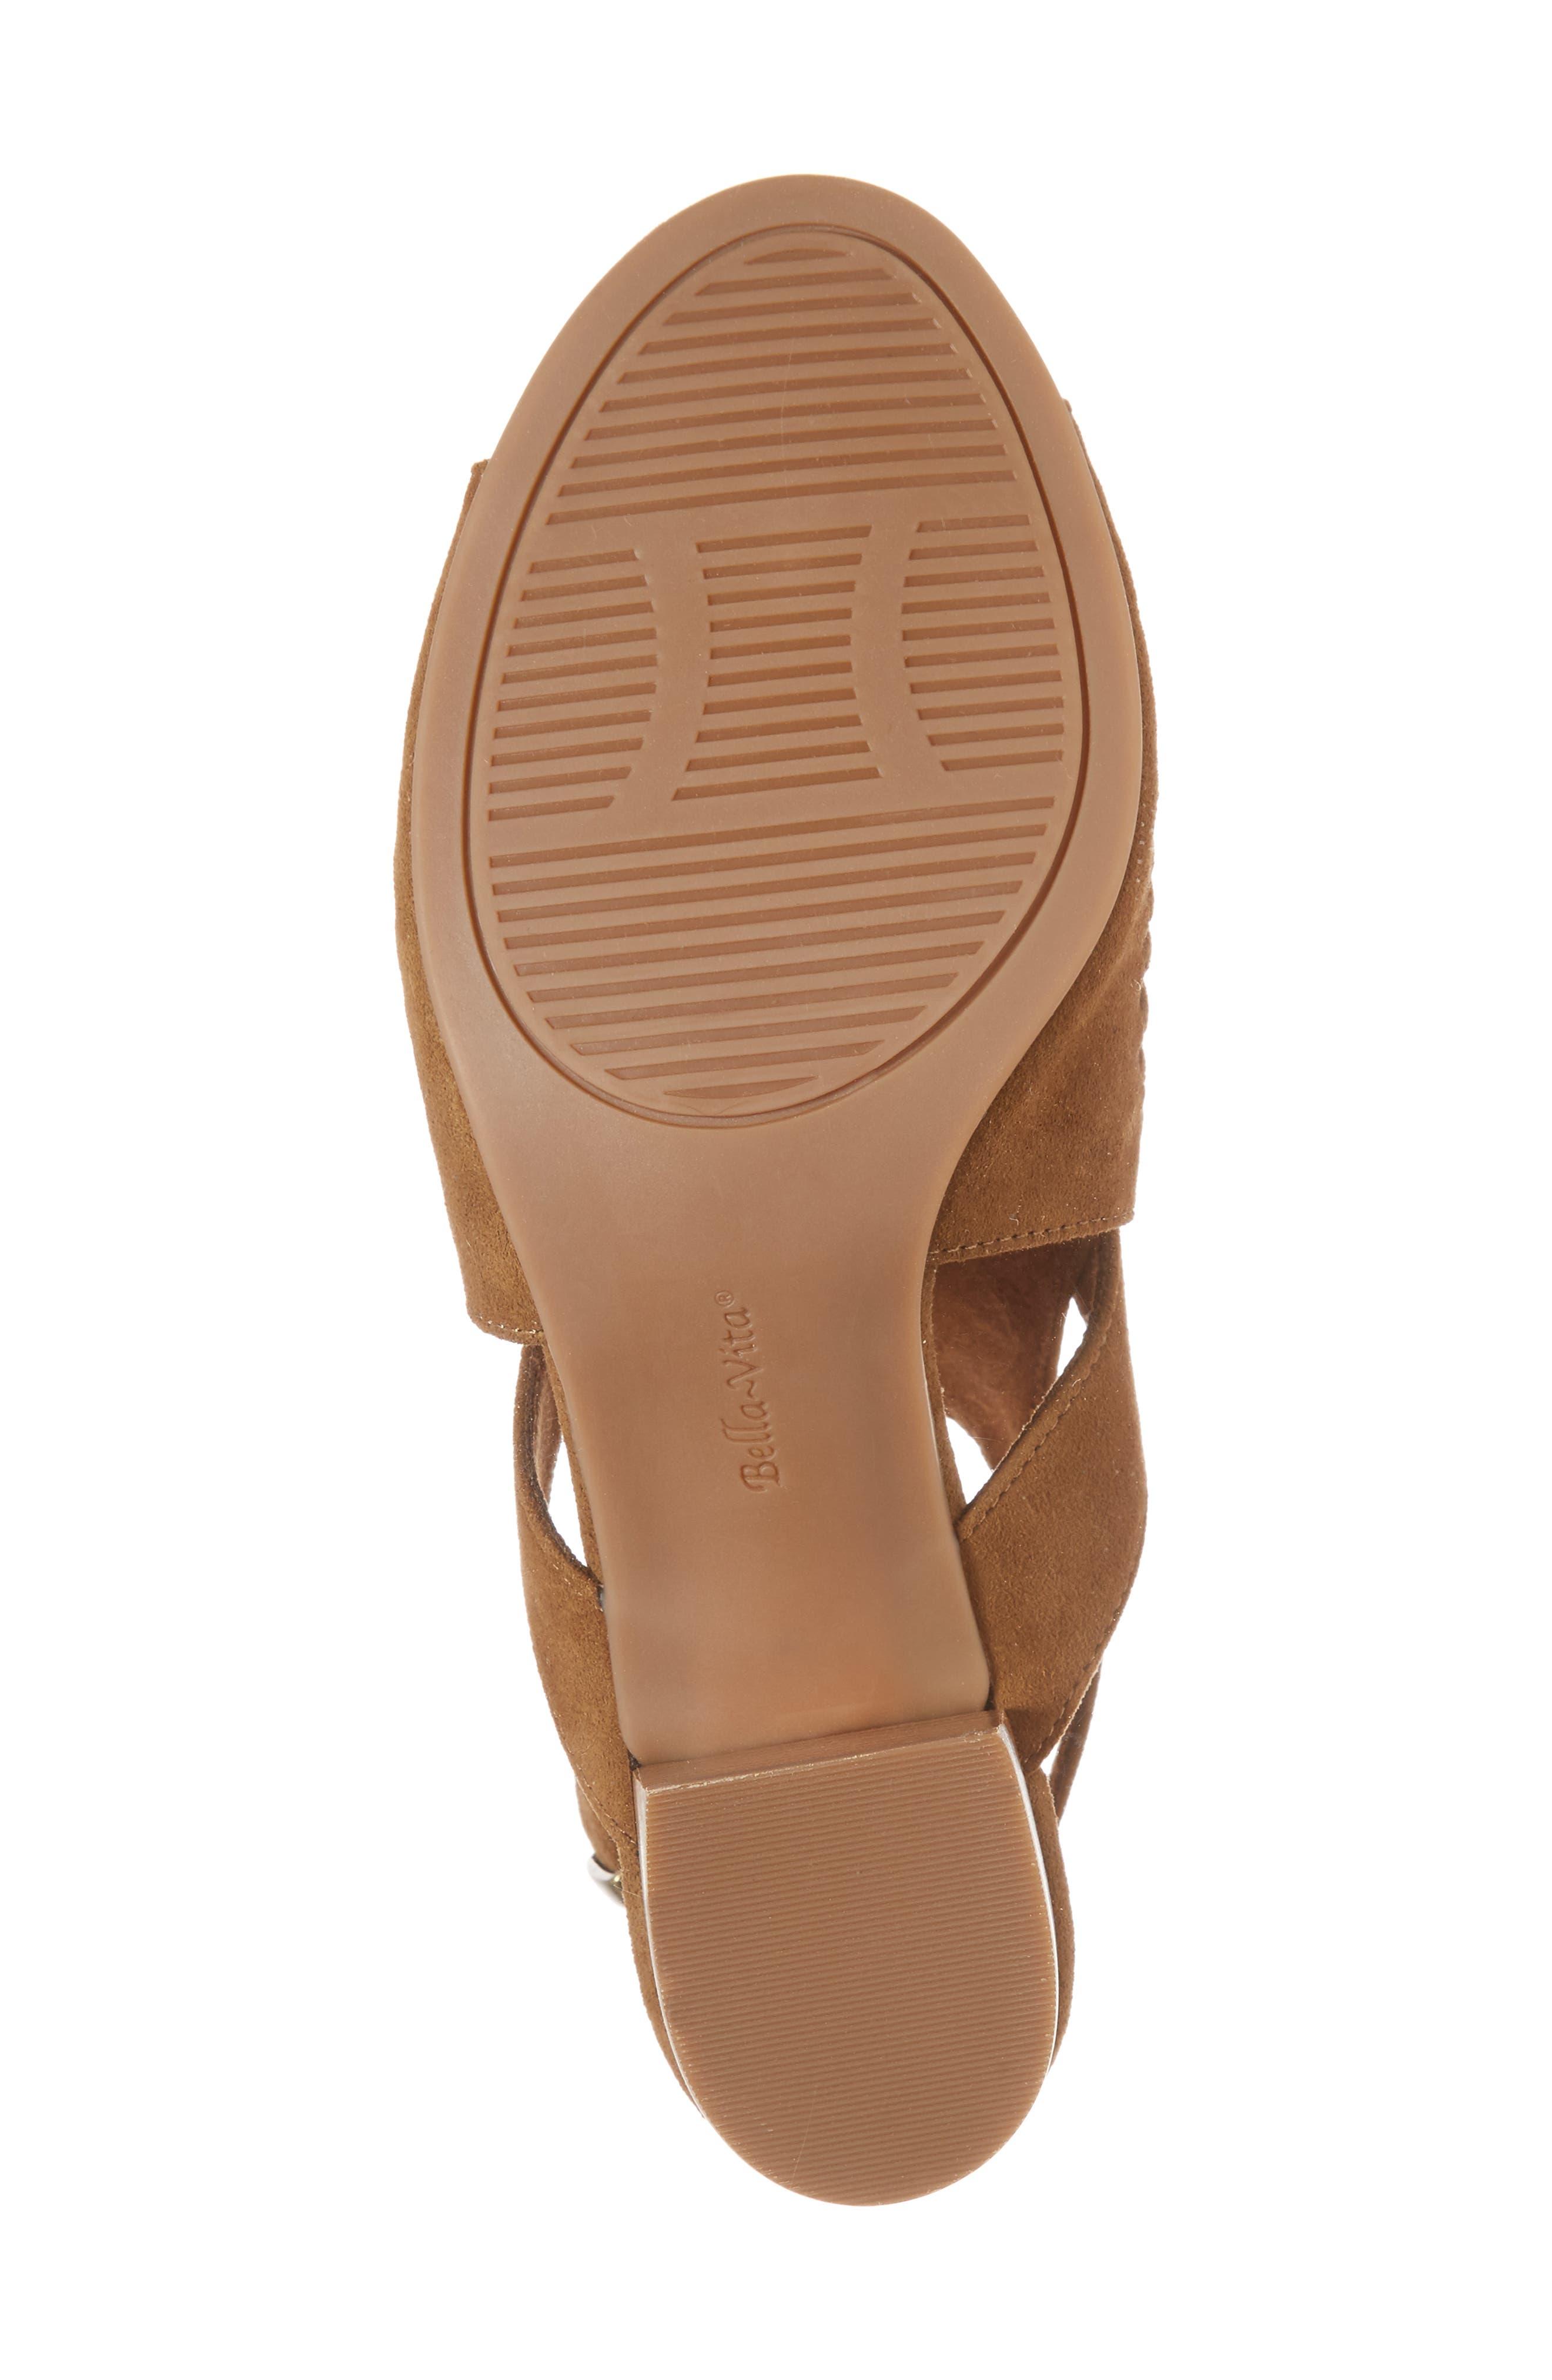 Finley Ankle Strap Sandal,                             Alternate thumbnail 27, color,